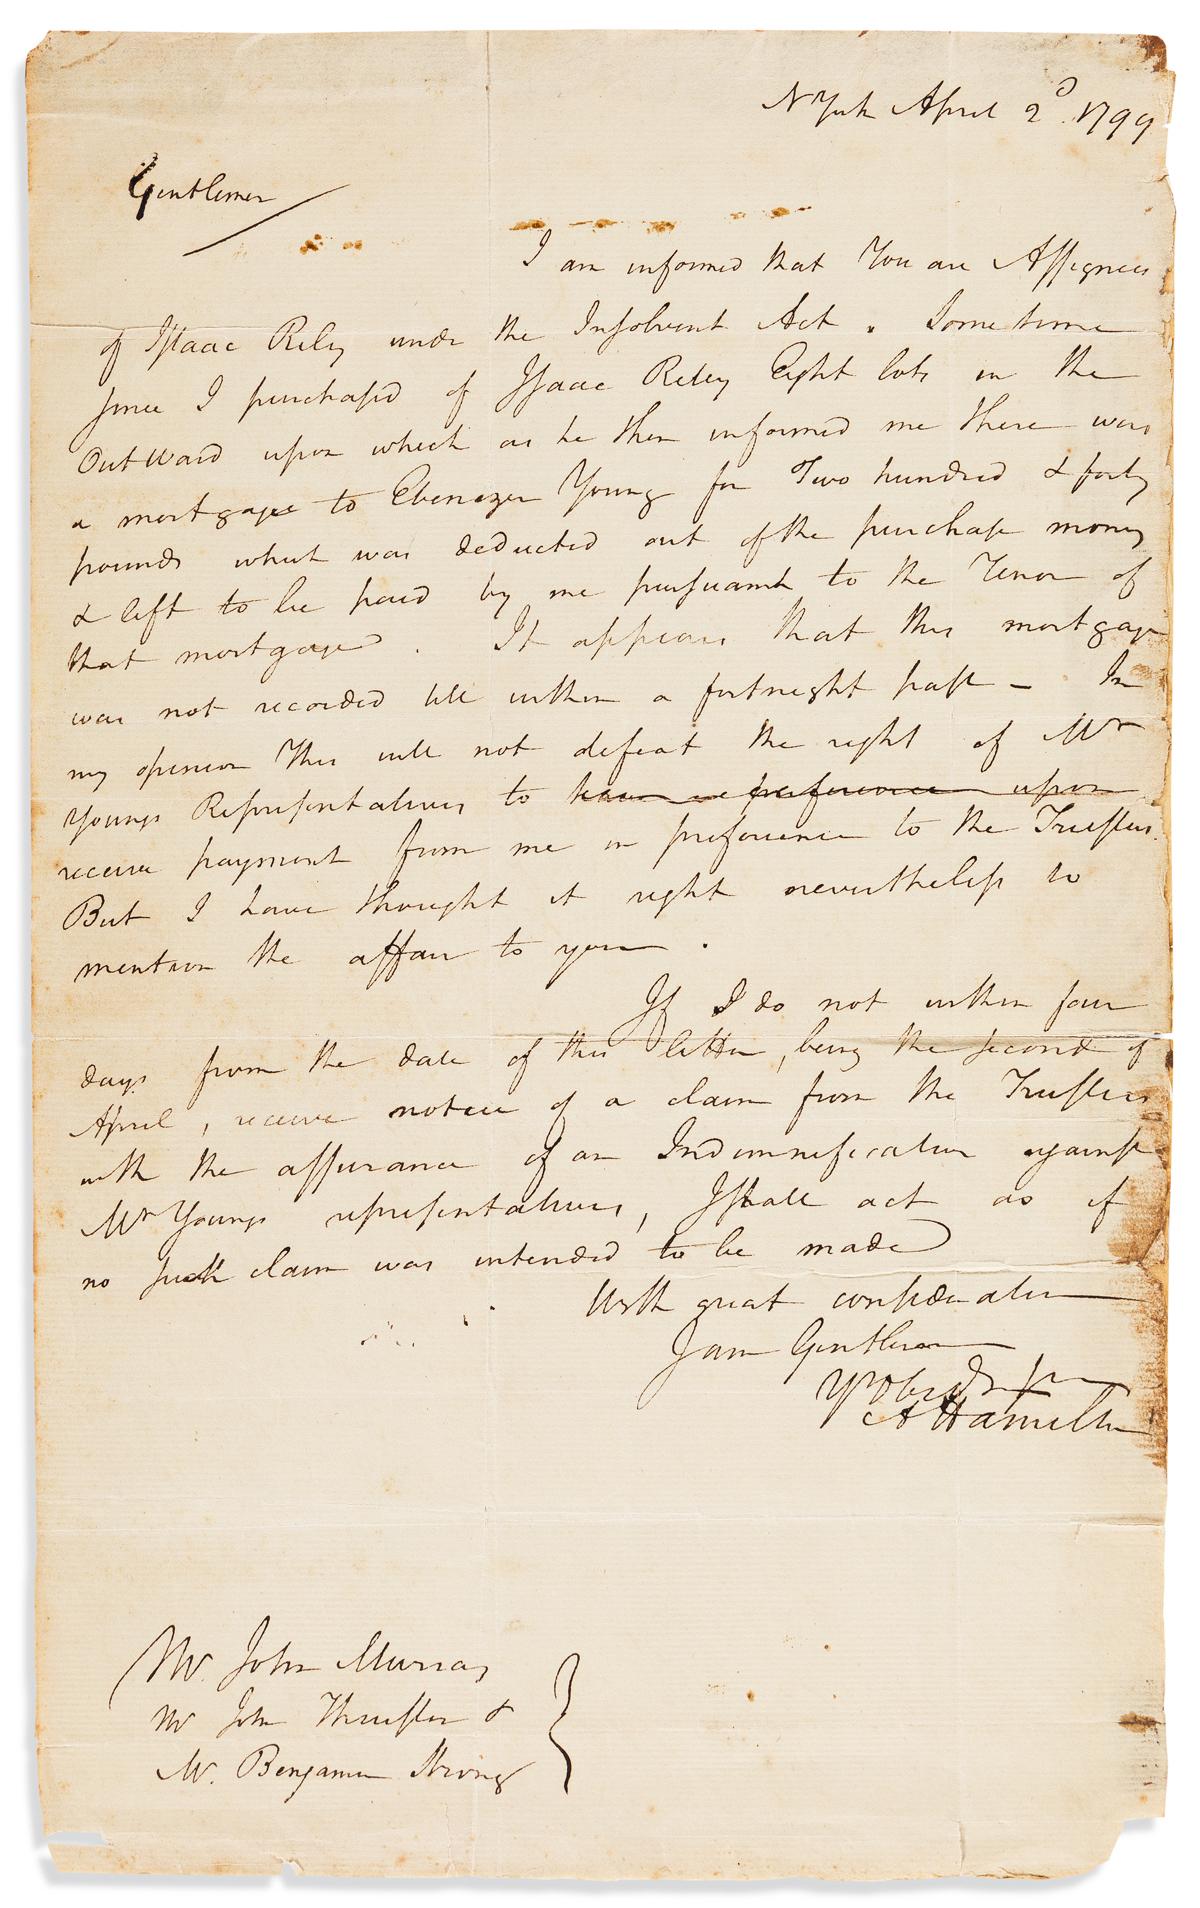 HAMILTON, ALEXANDER. Autograph Letter Signed, AHamilton, to John Murray, John Thurston, and Benjamin Strong,